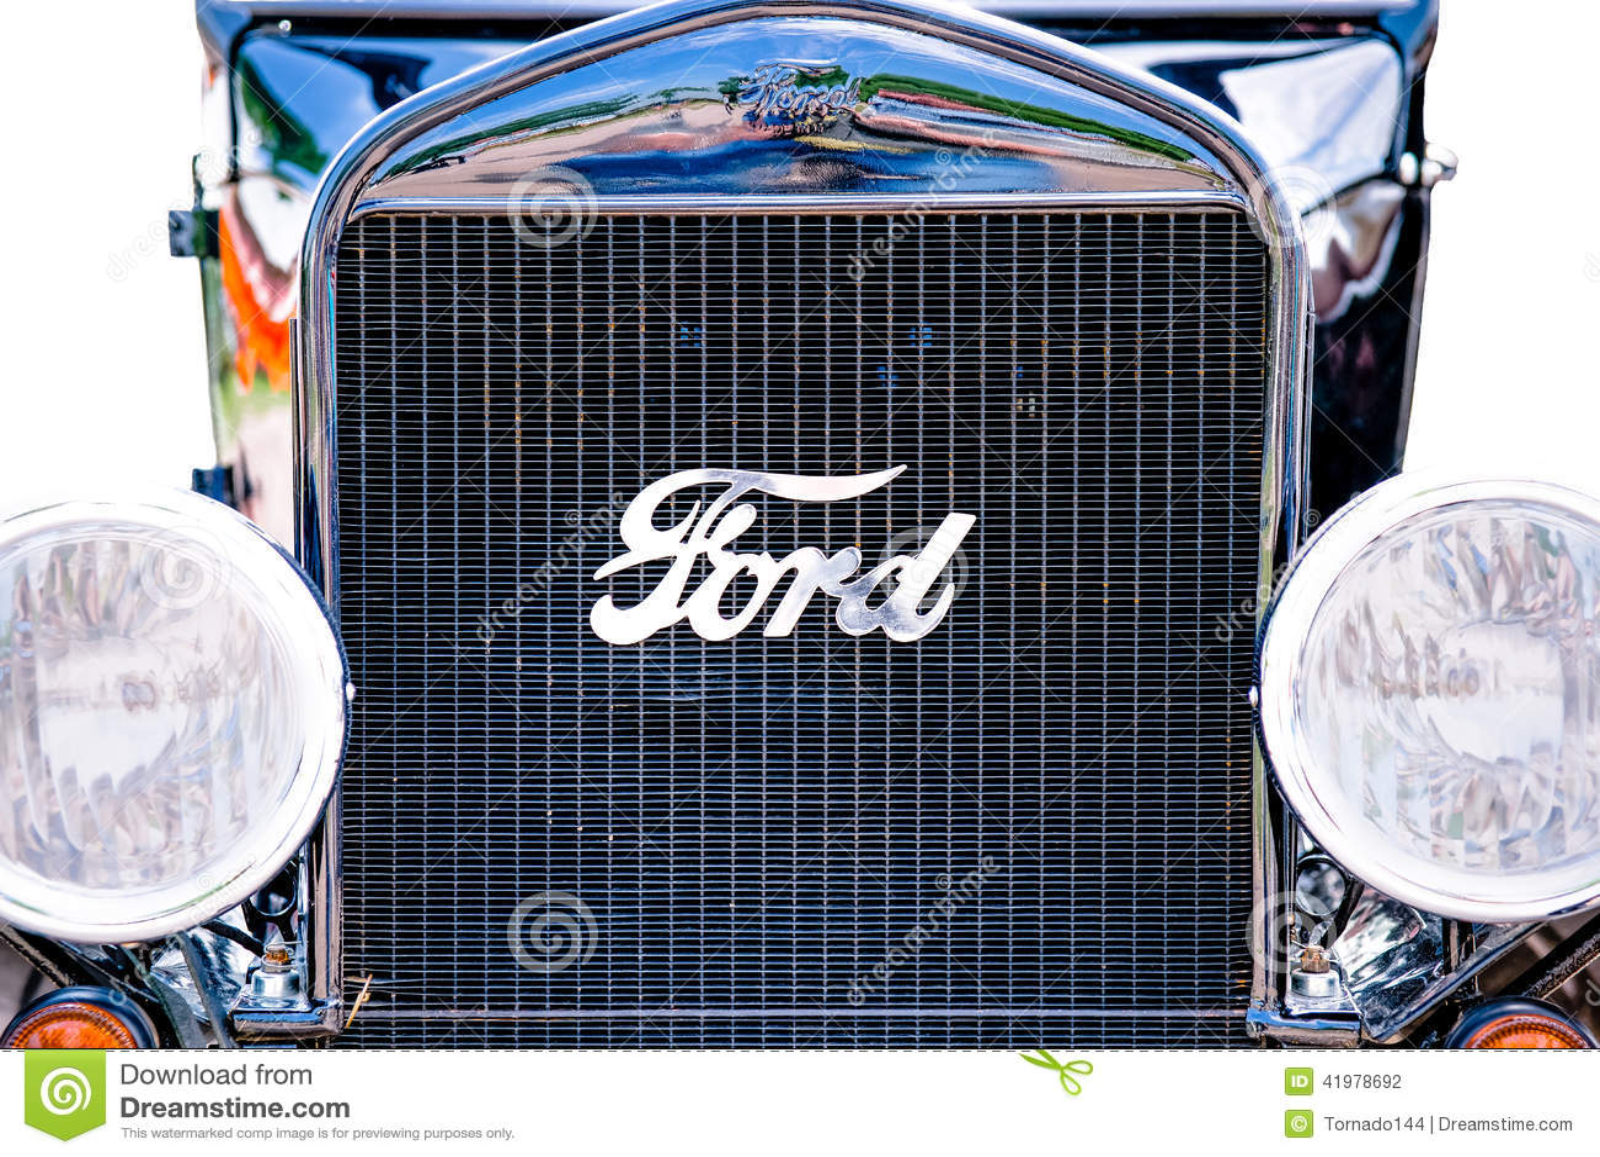 Design of a car radiator - Editorial Stock Photo